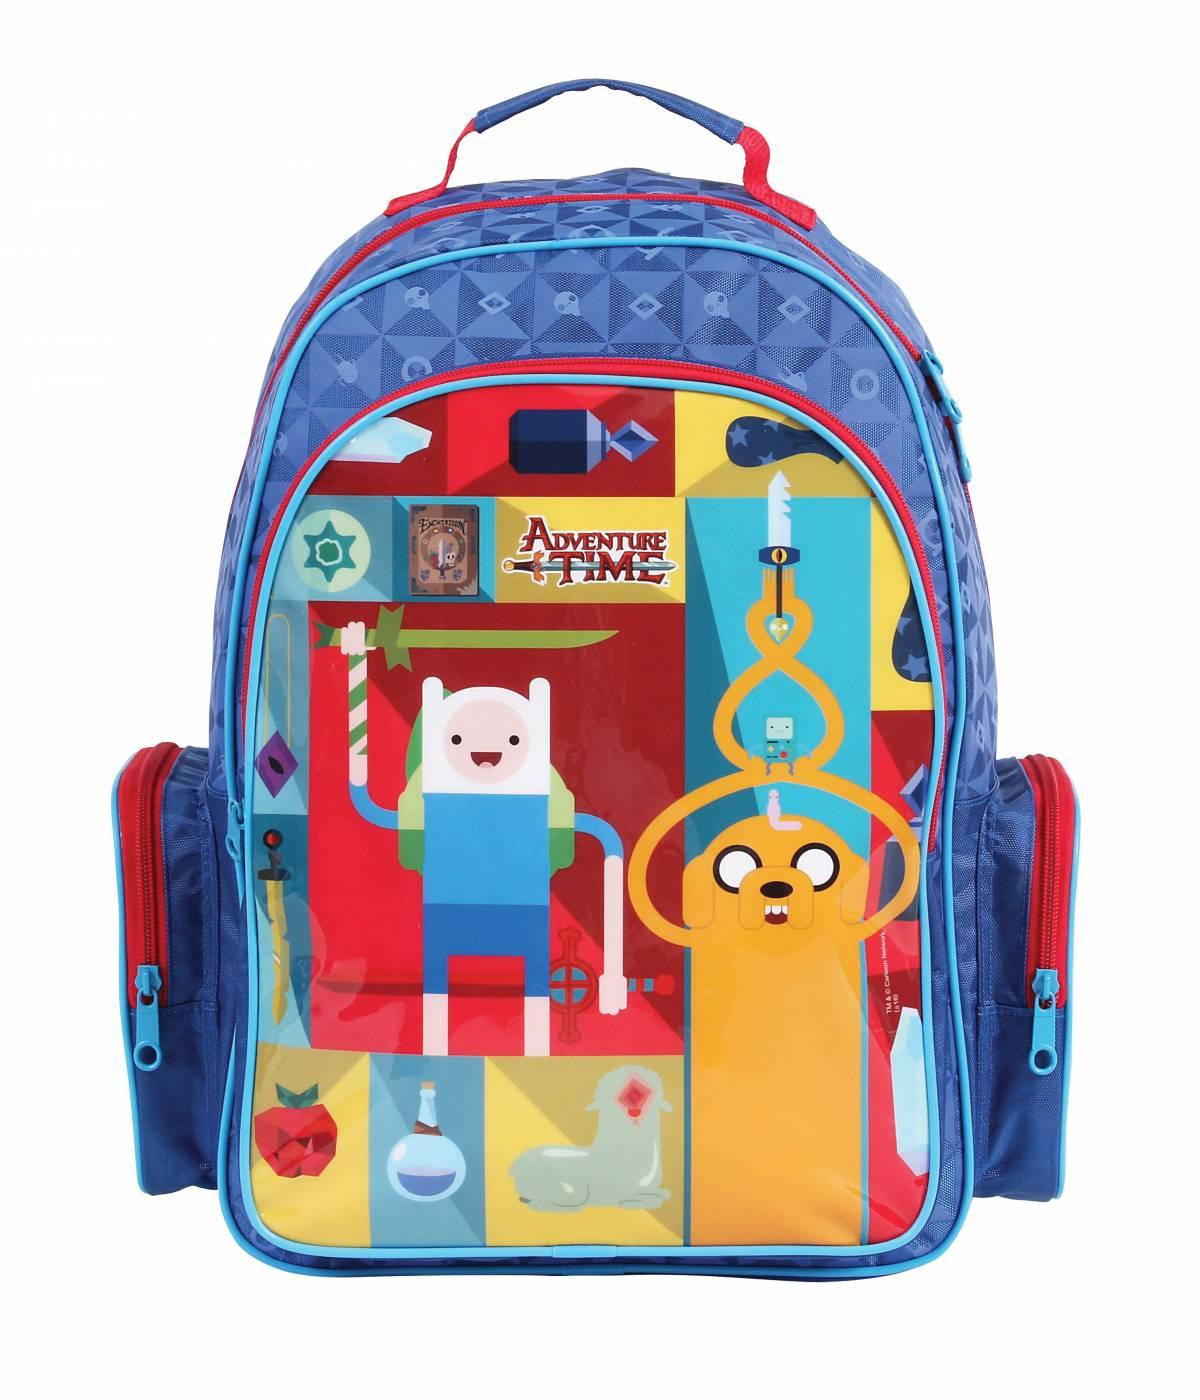 Mochila DMW Grande Adventure Time 49019